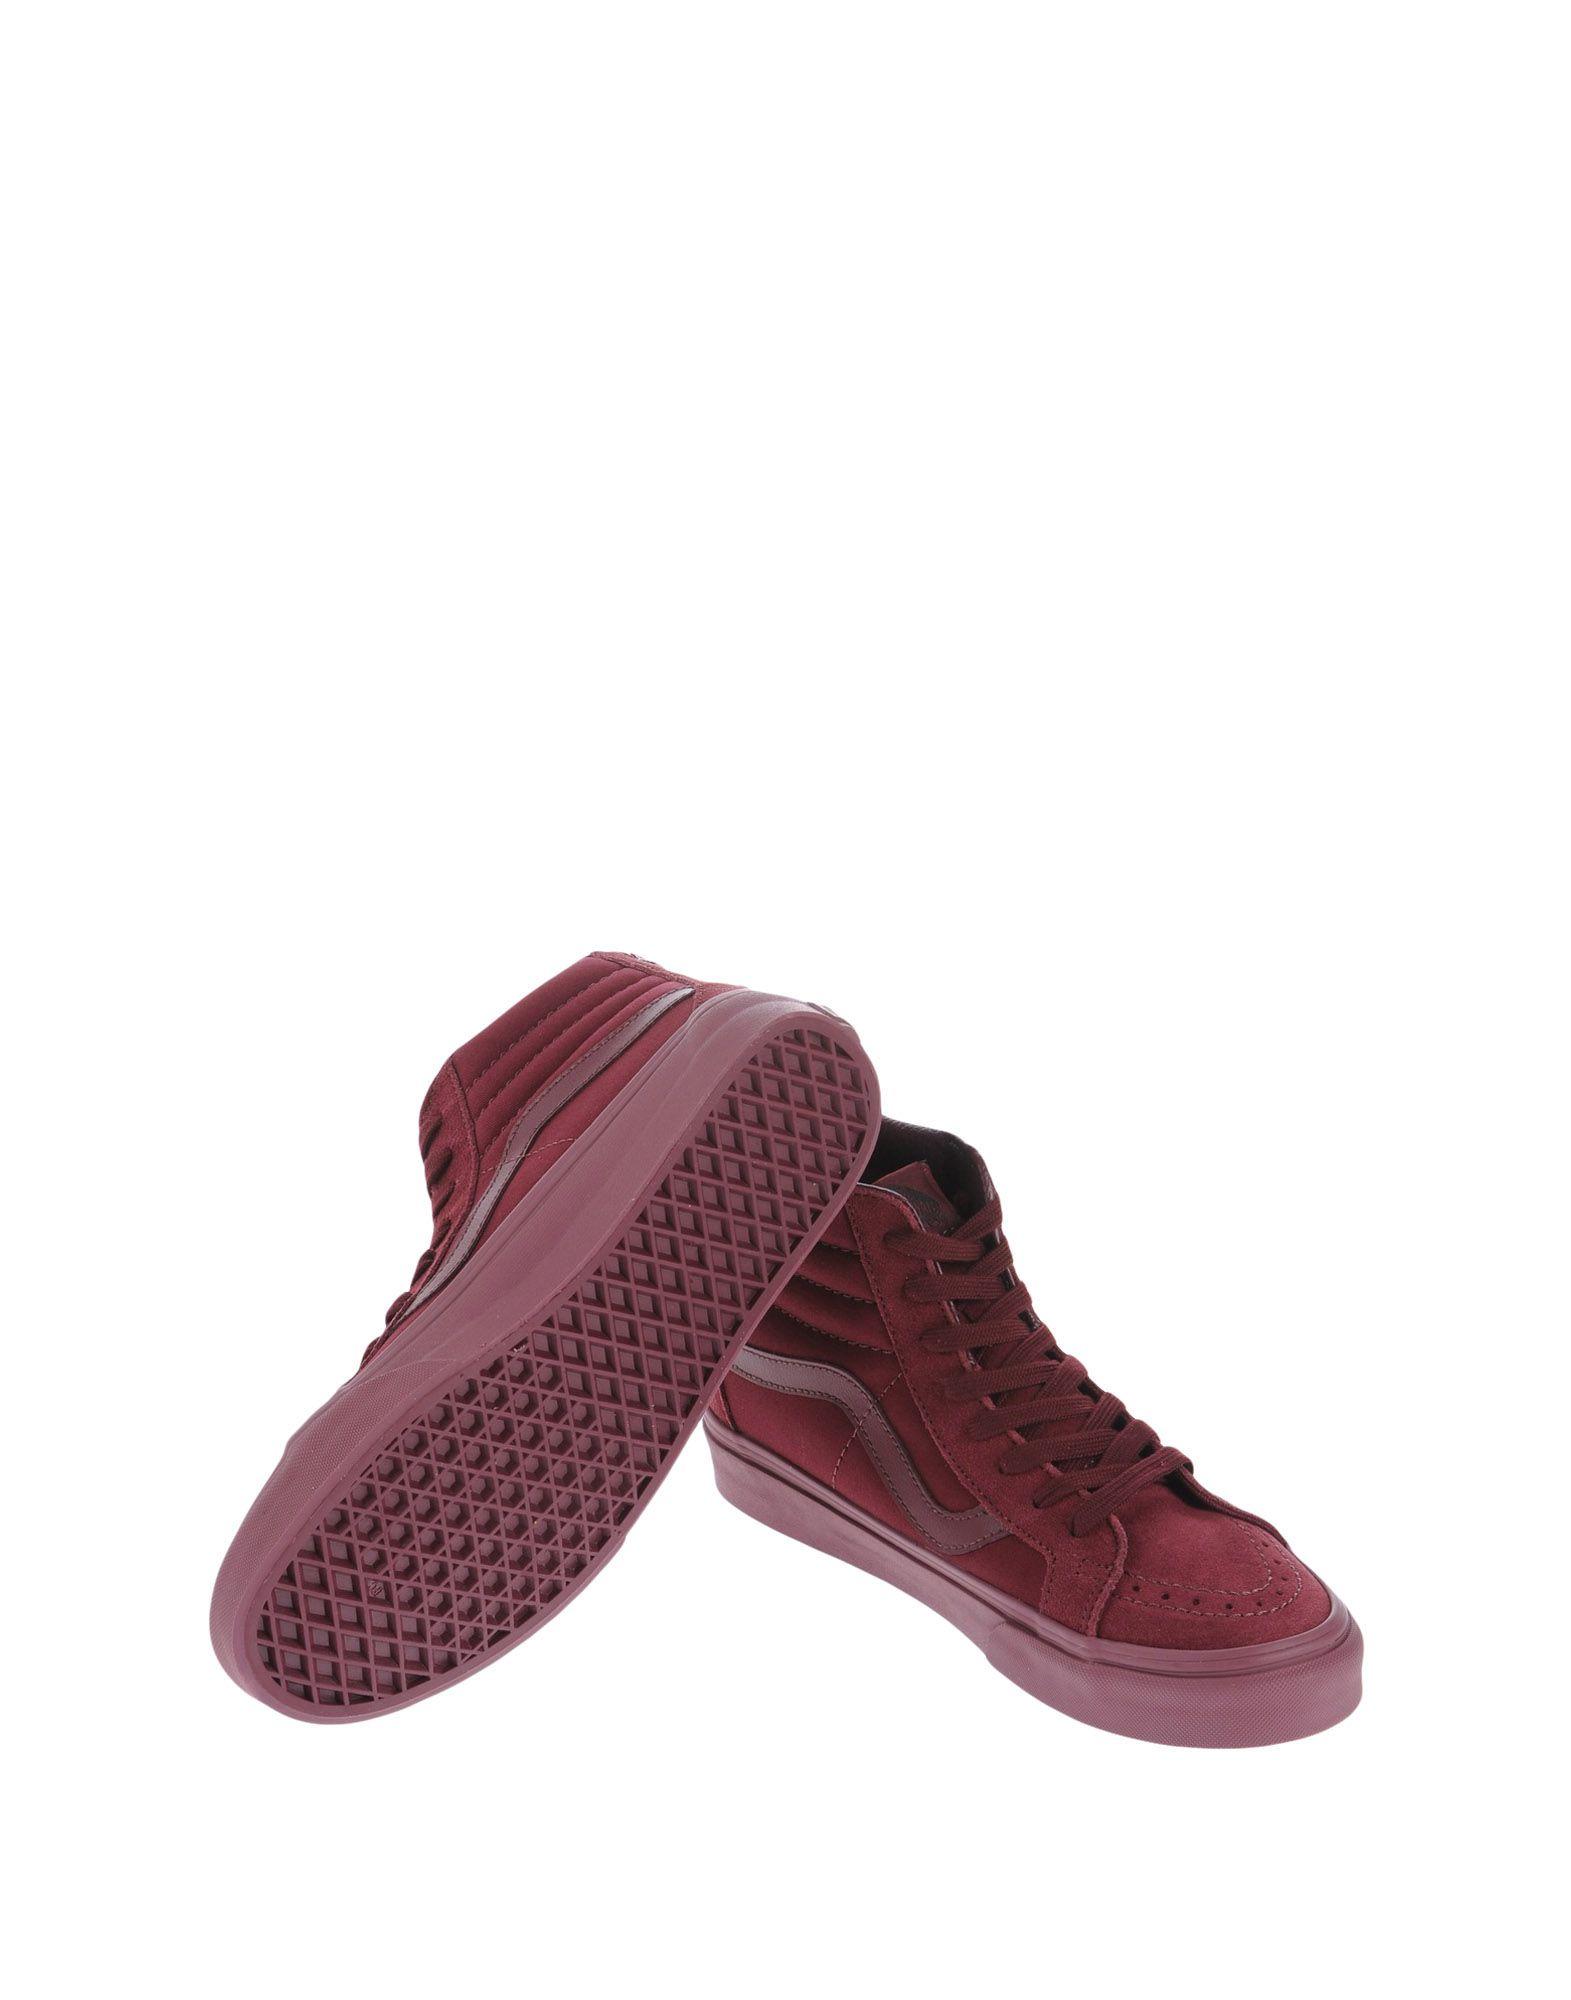 Sneakers Vans U Sk8-Hi Reissue Zip Mono Port Roy - Femme - Sneakers Vans sur